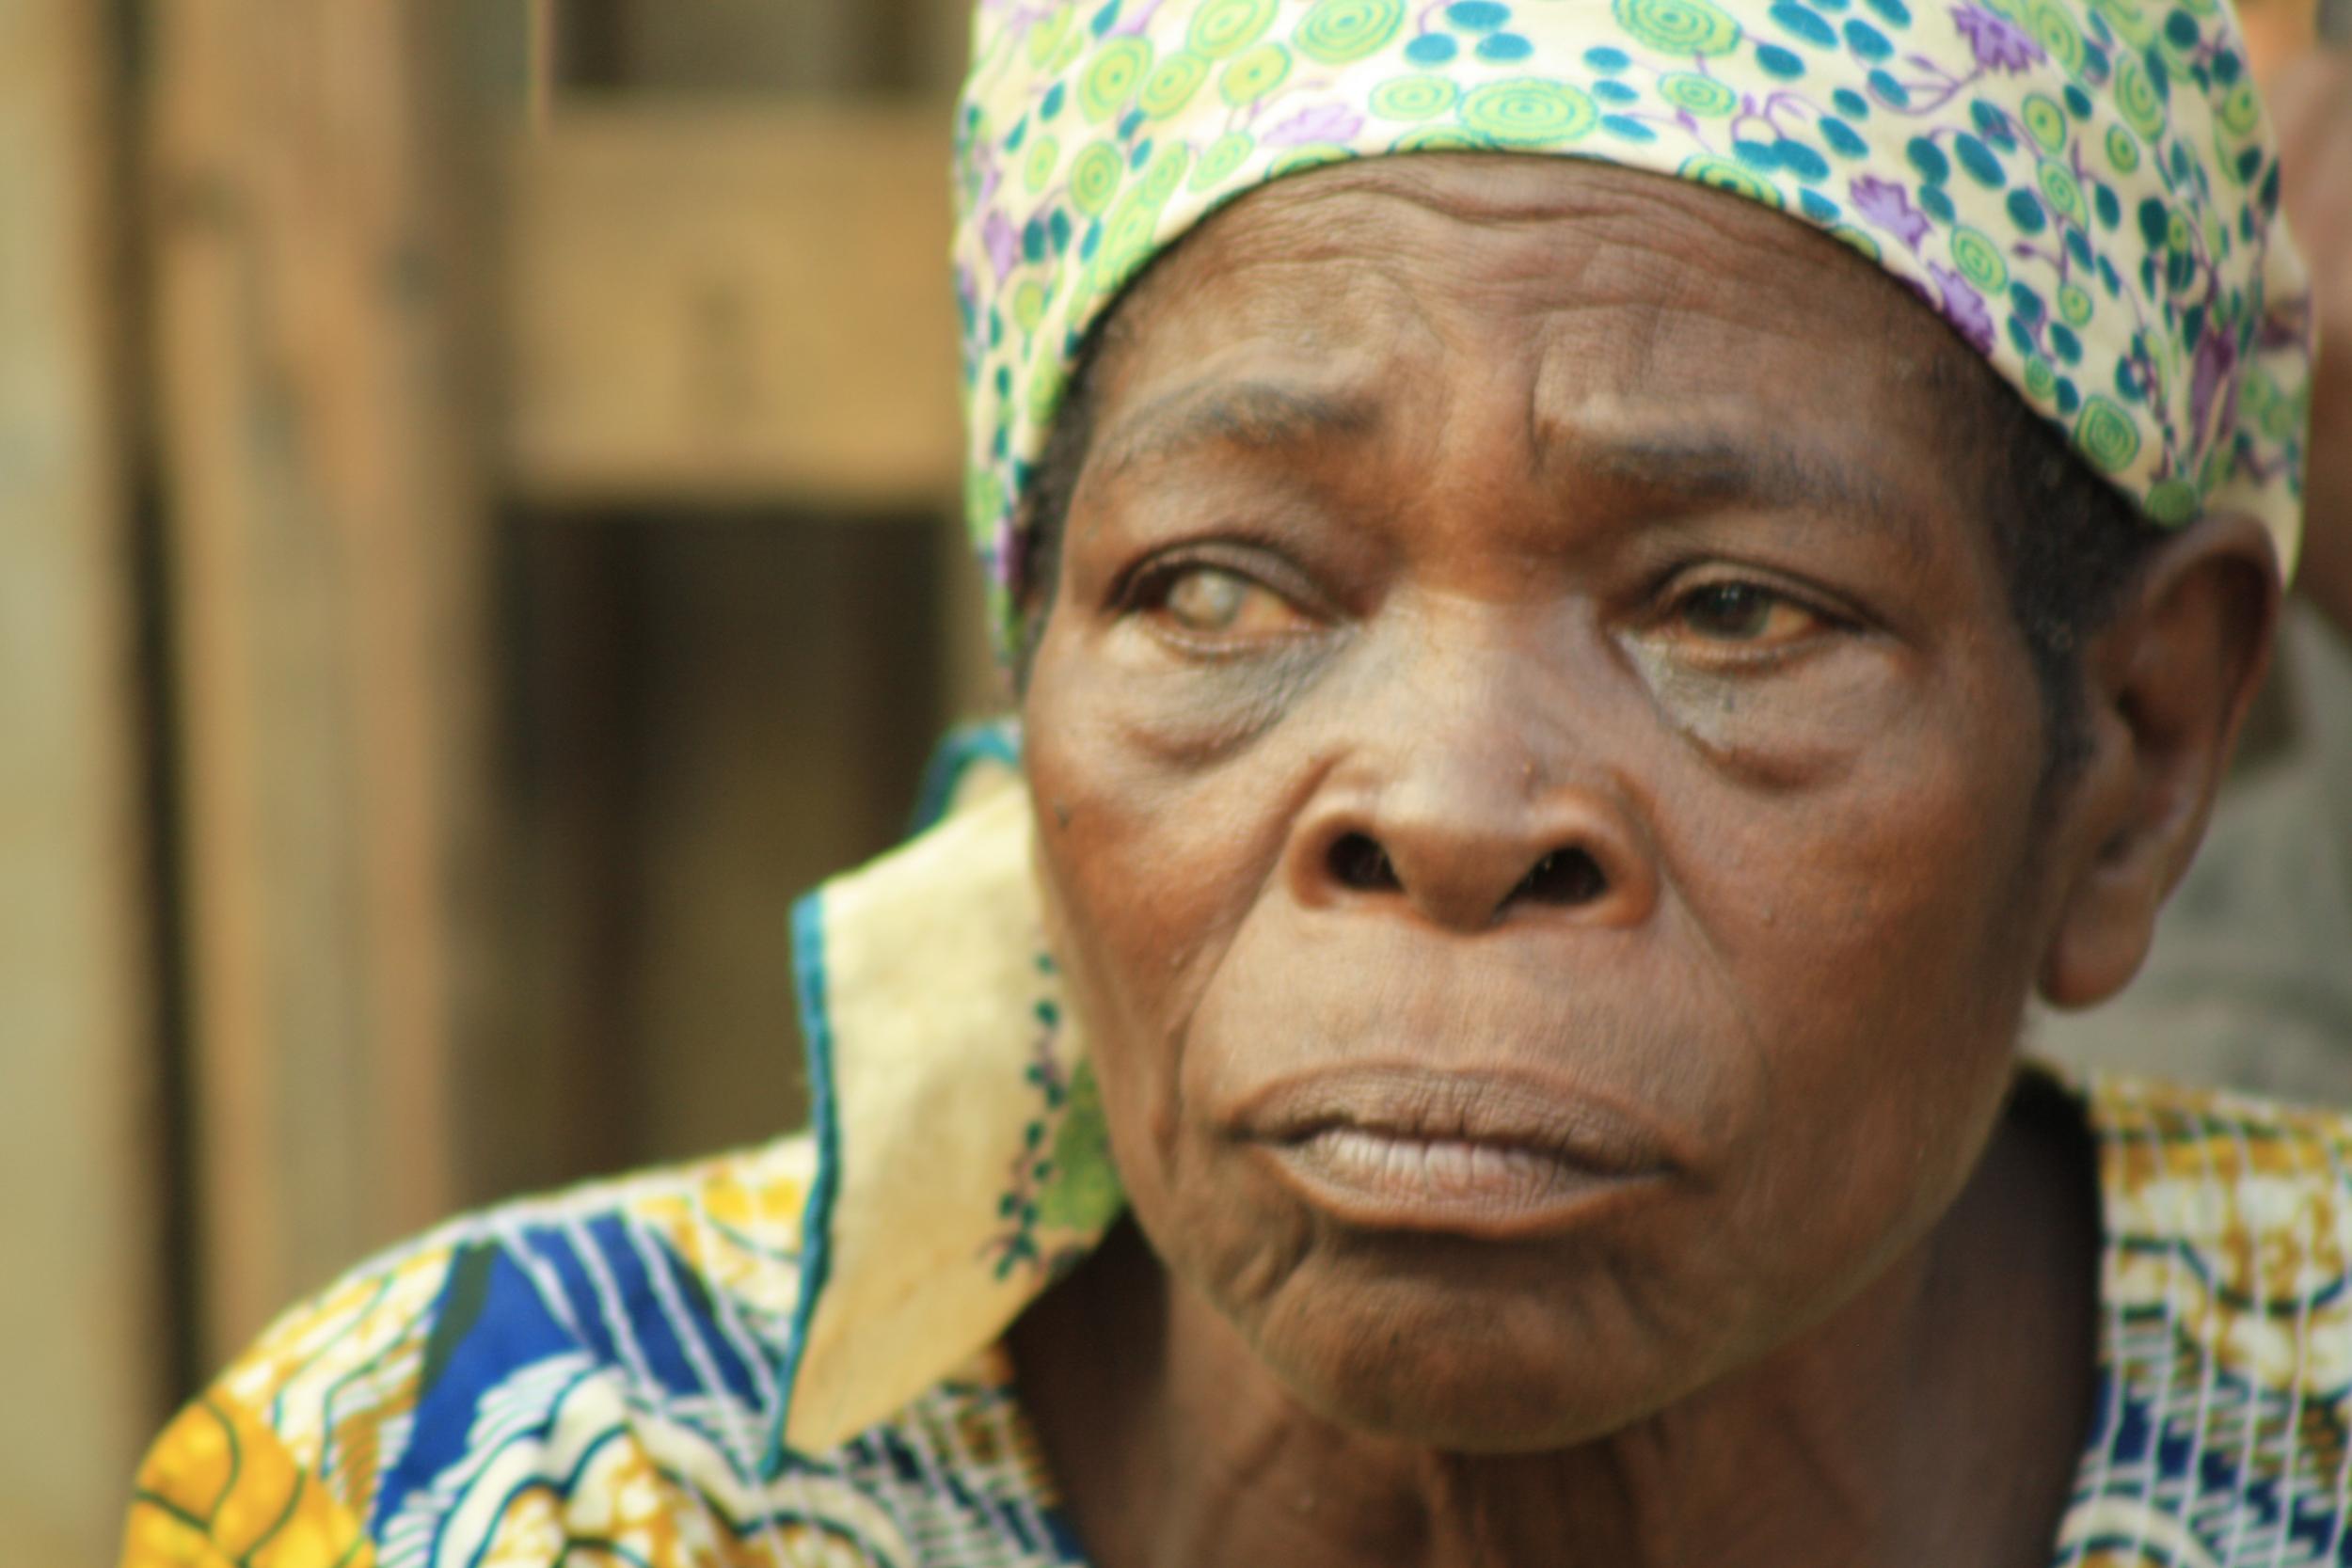 woman with milky eye.jpg